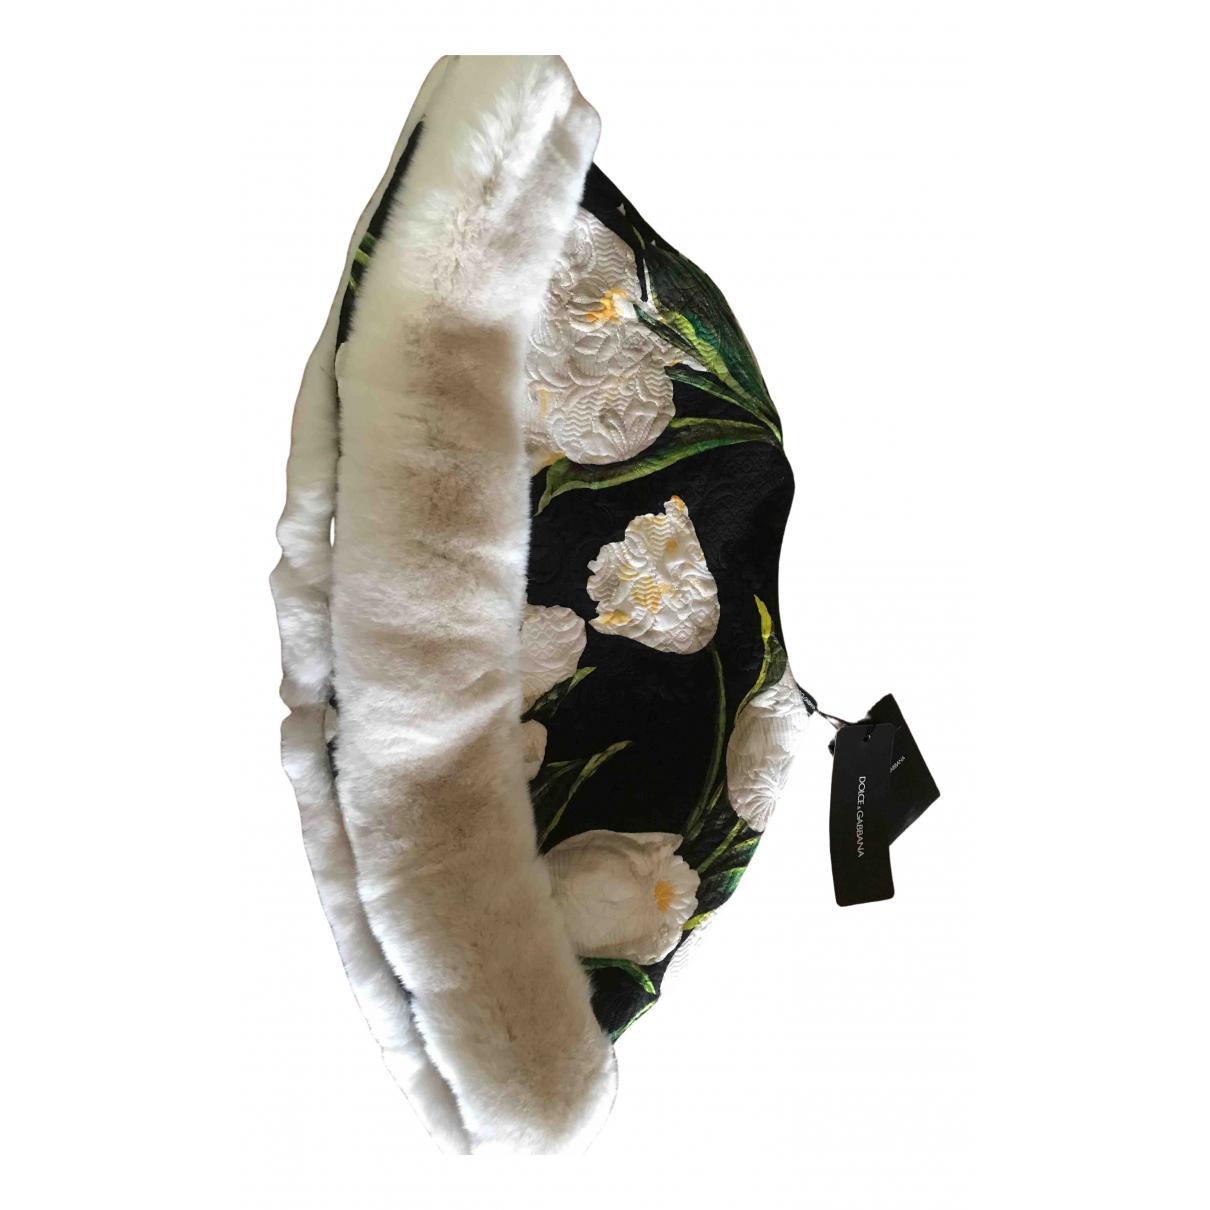 Dolce & Gabbana N Black Rabbit Knitwear for Kids 6 years - up to 114cm FR